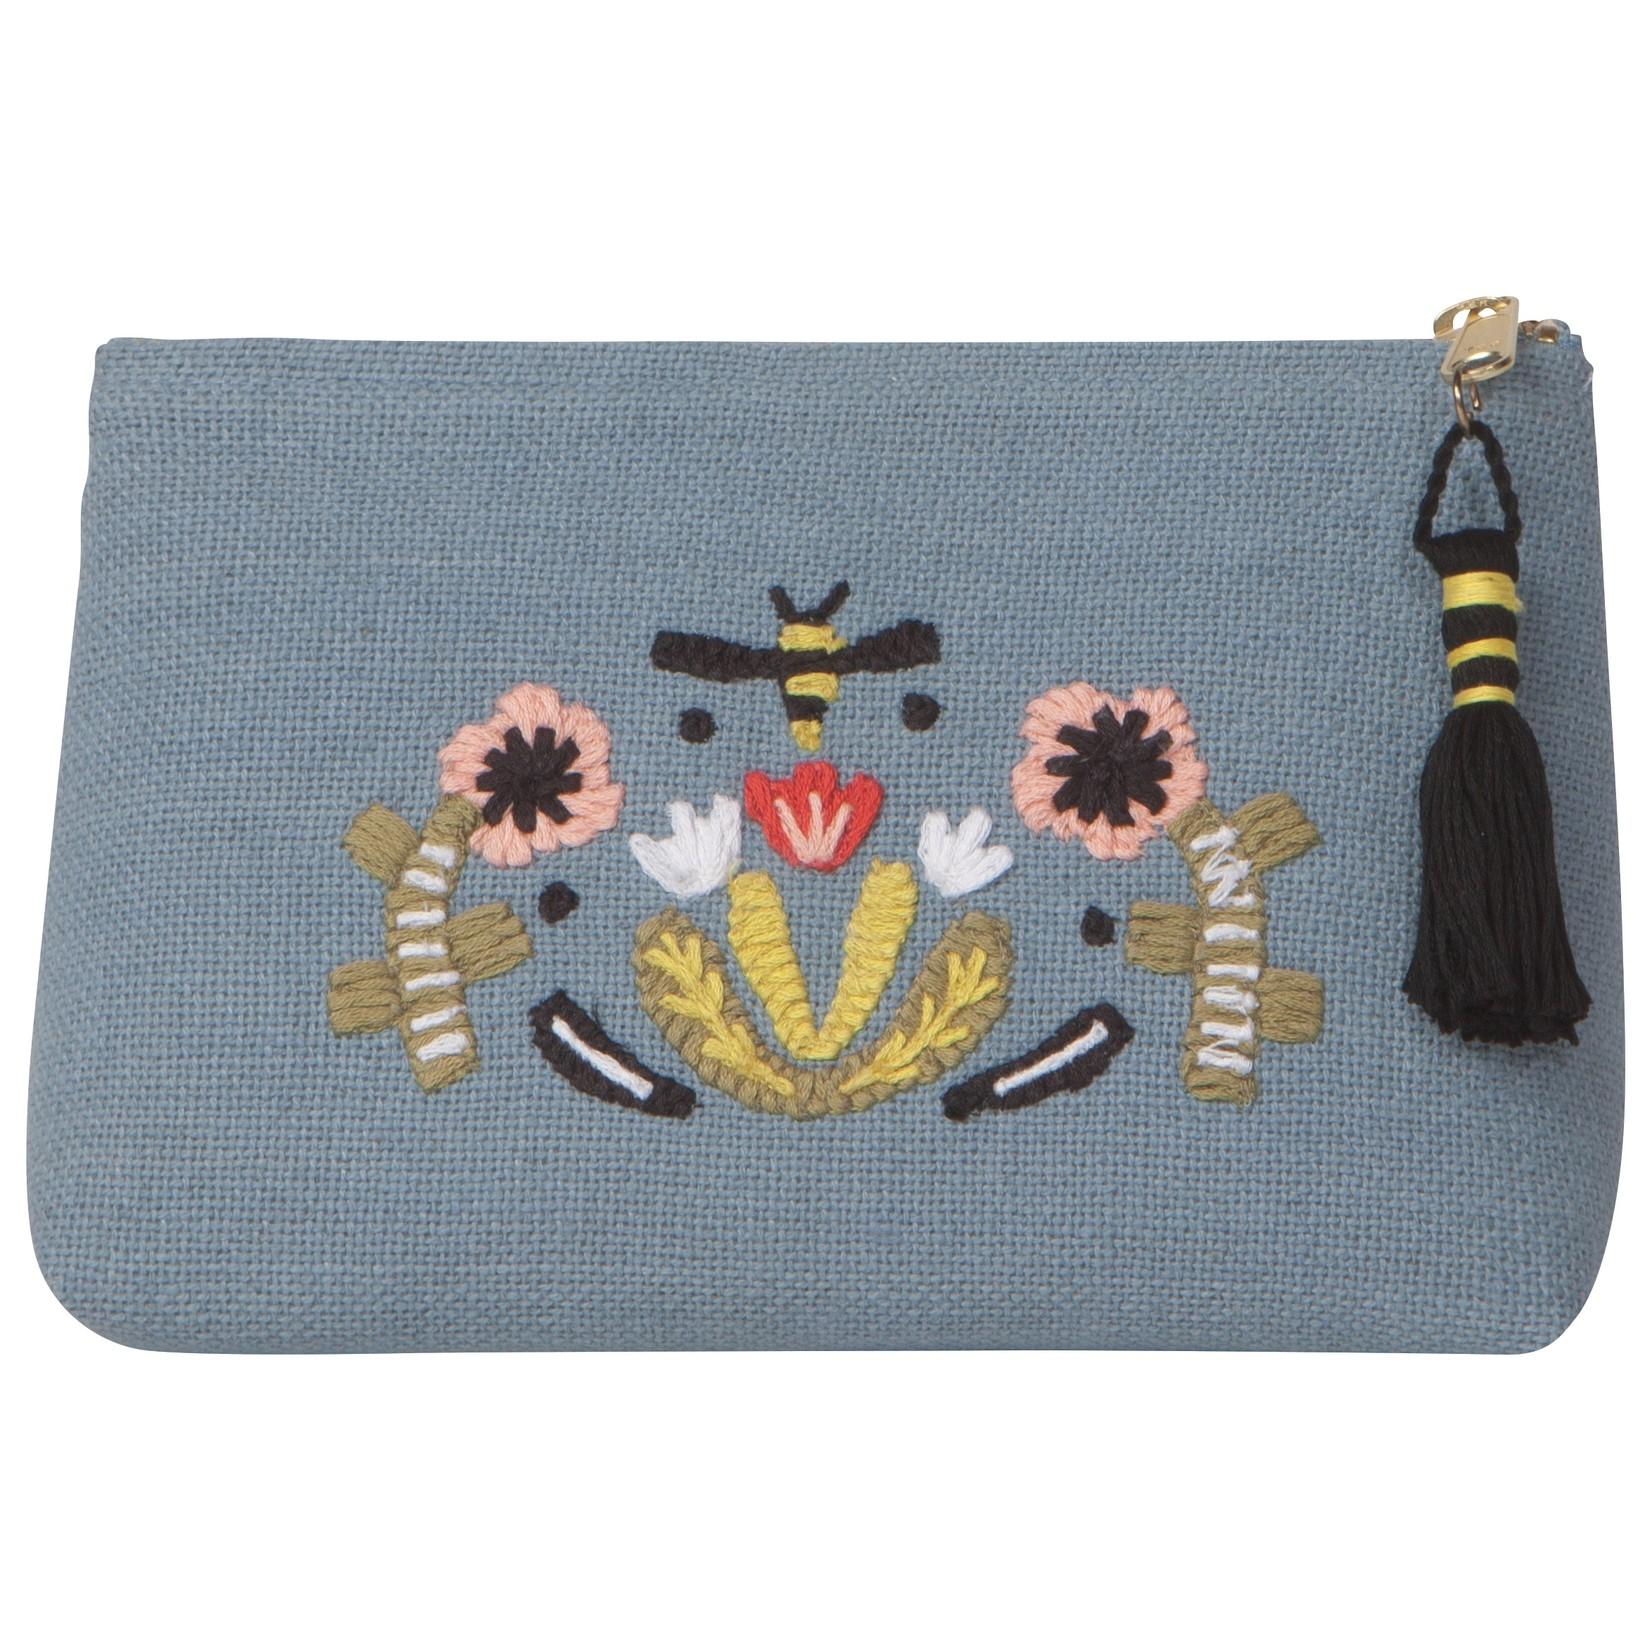 Danica Studio Small Linen Cosmetic Bag